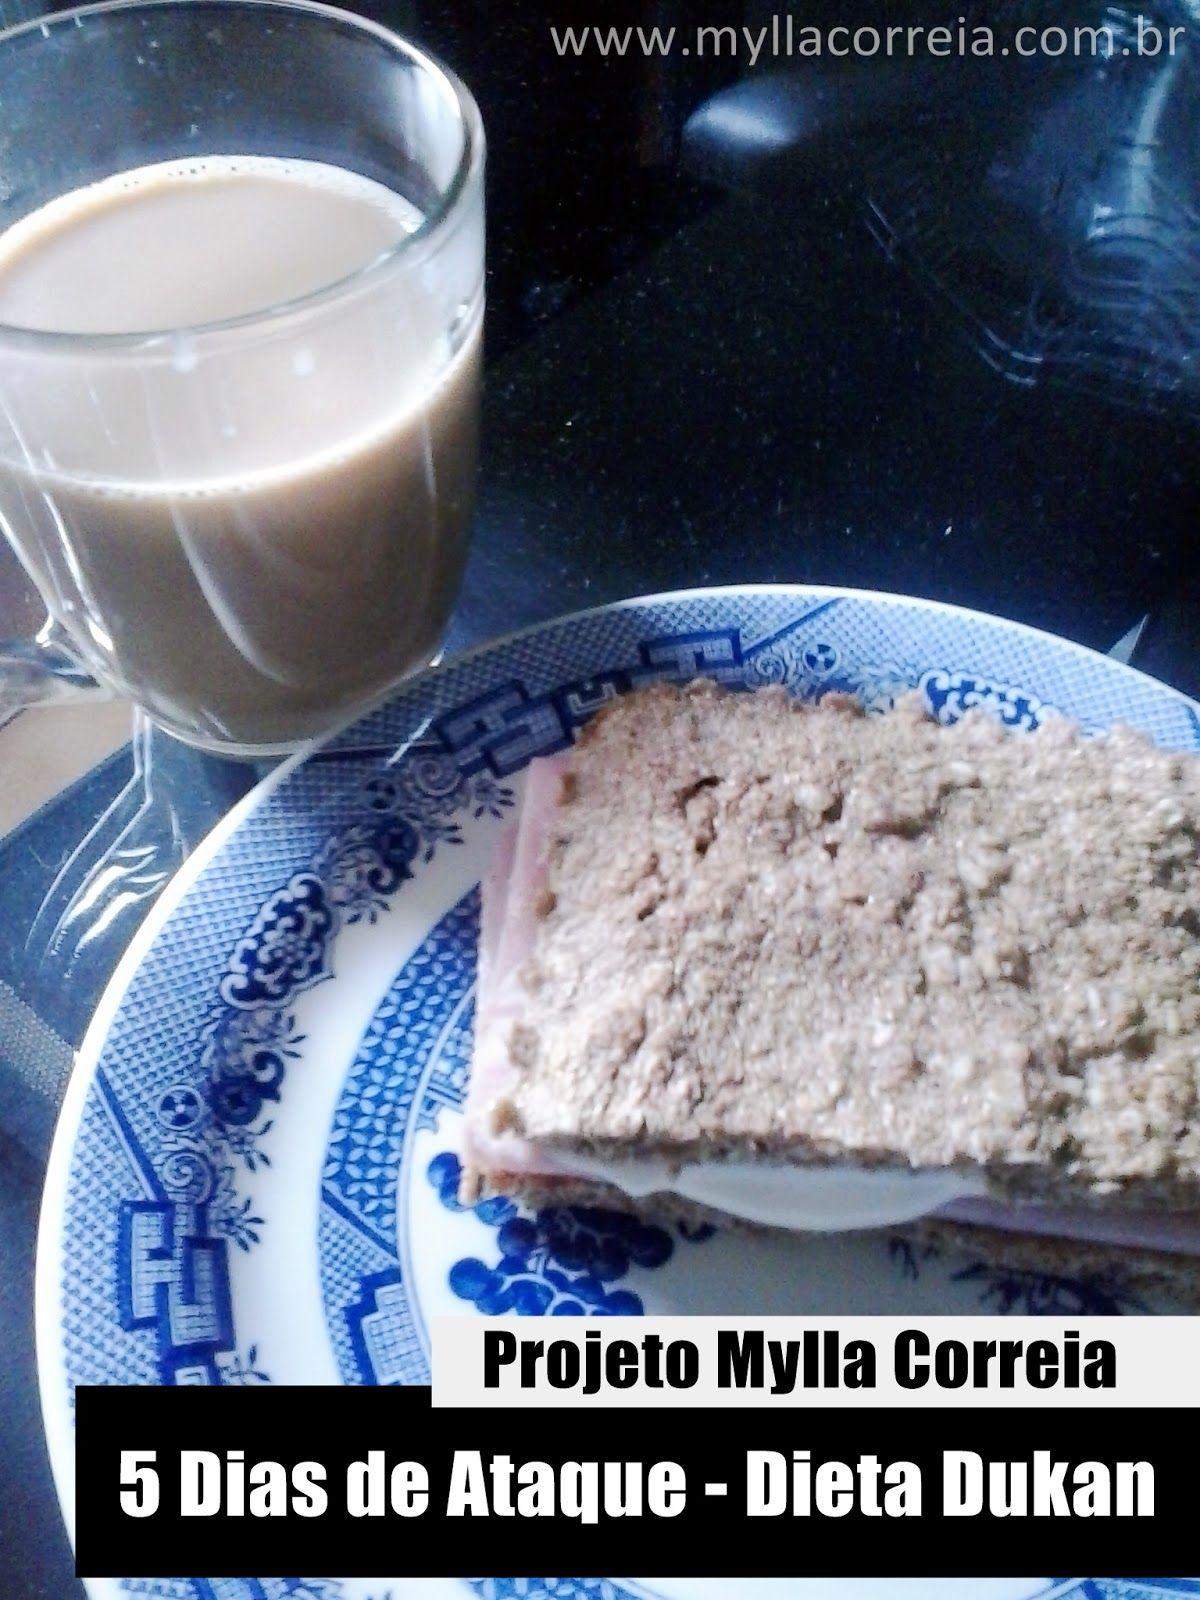 Projeto Mylla Correia: Cardápio Dukan - 5 dias de Ataque/PP